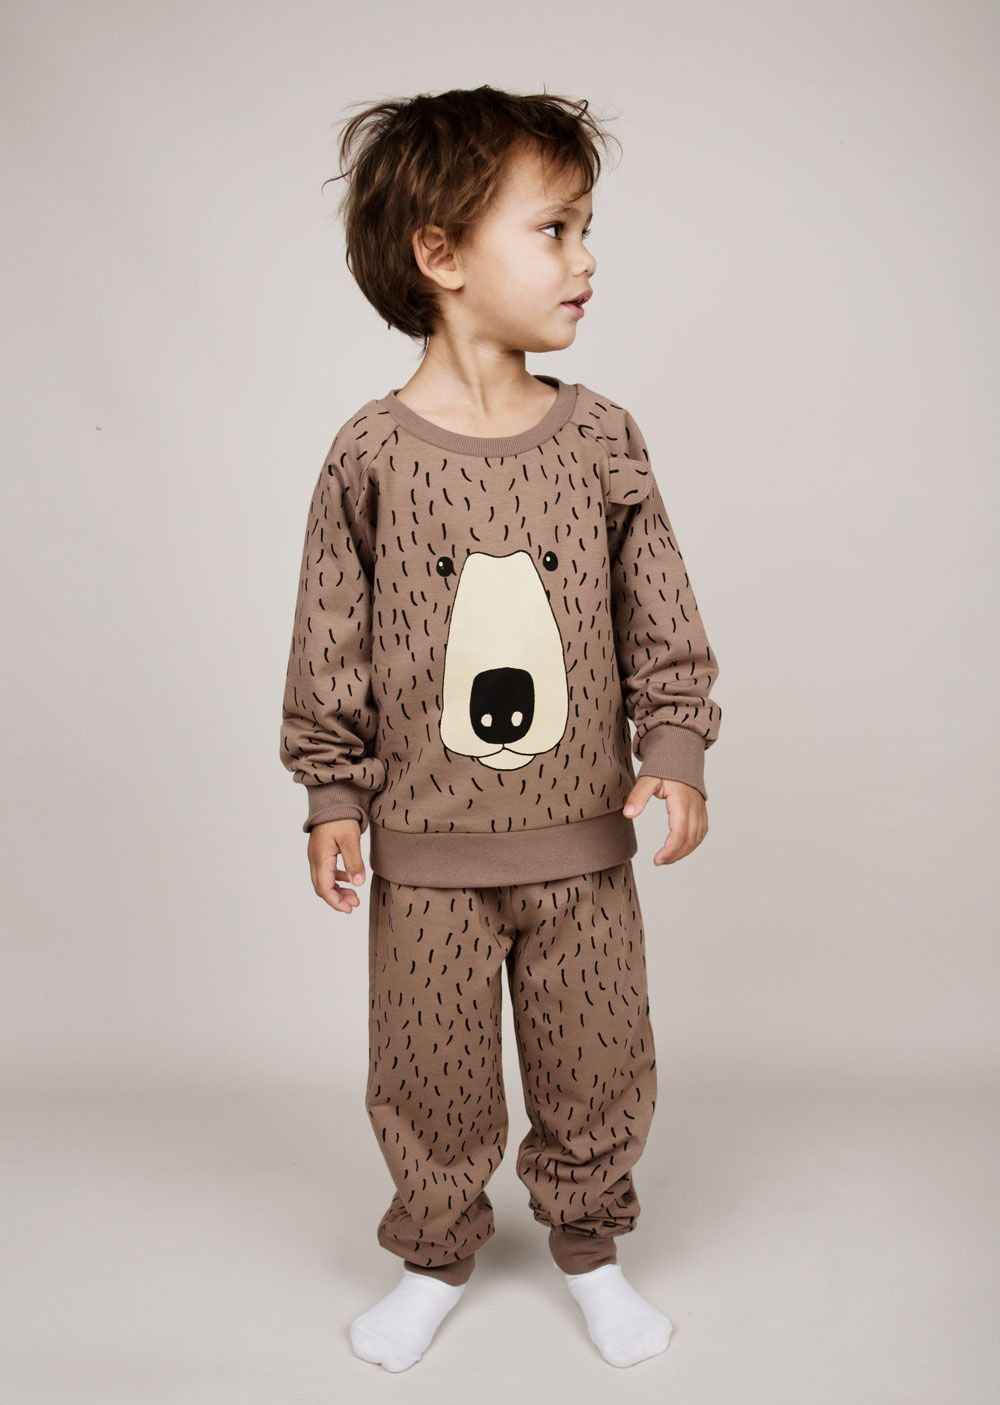 mini rodinis online shop aw14 quel carrousel pinterest barnkl der bebis och kl der. Black Bedroom Furniture Sets. Home Design Ideas